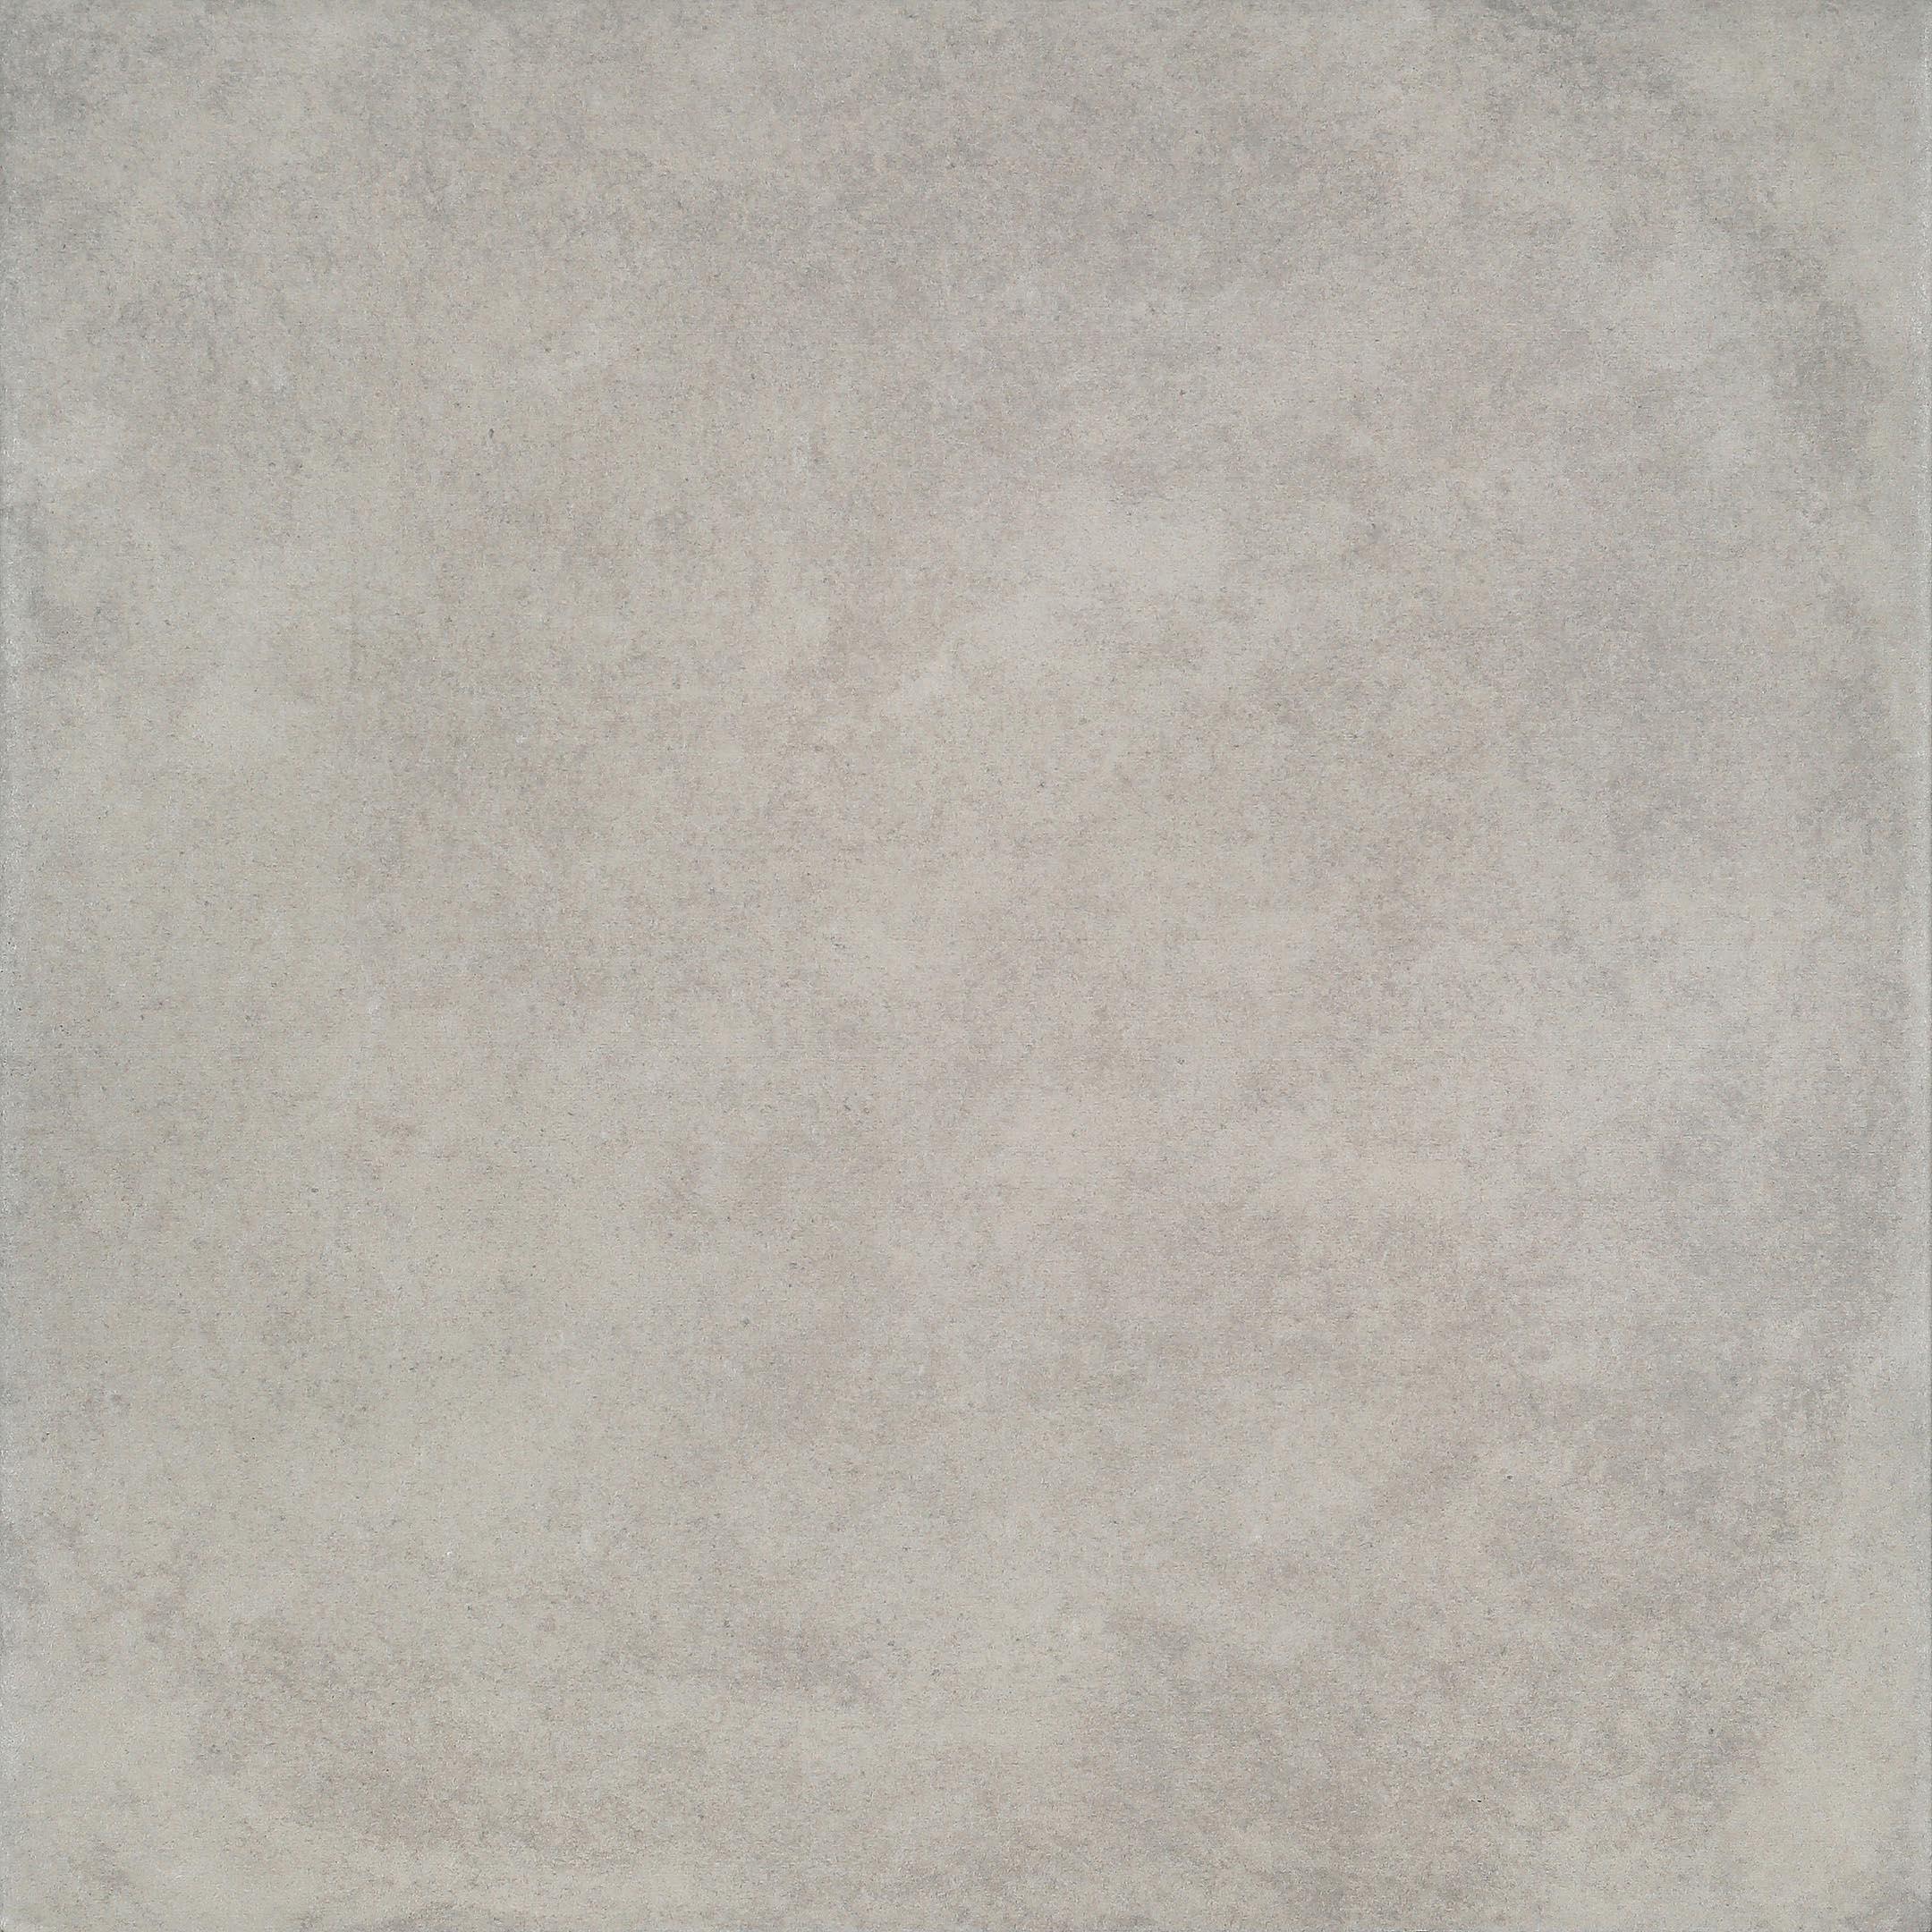 Керамогранит Cersanit Carpet коричневый 298х298х8,5 мм (12 шт.=1,06 кв.м)